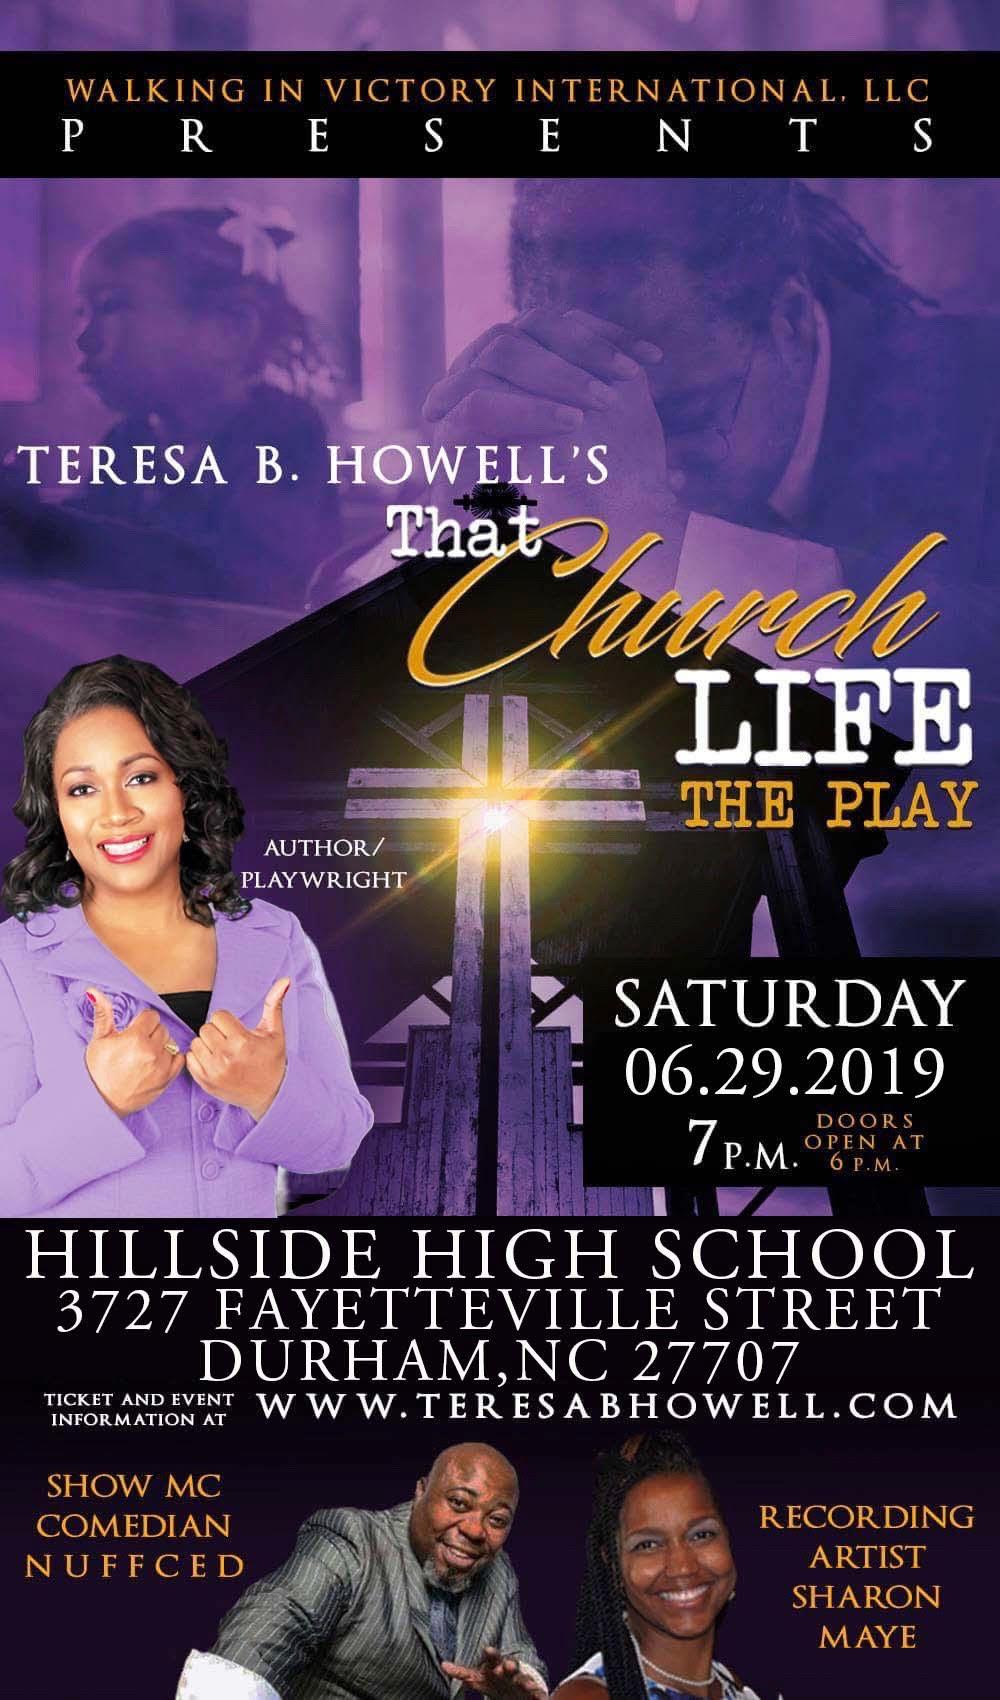 That Church Life Play 2019